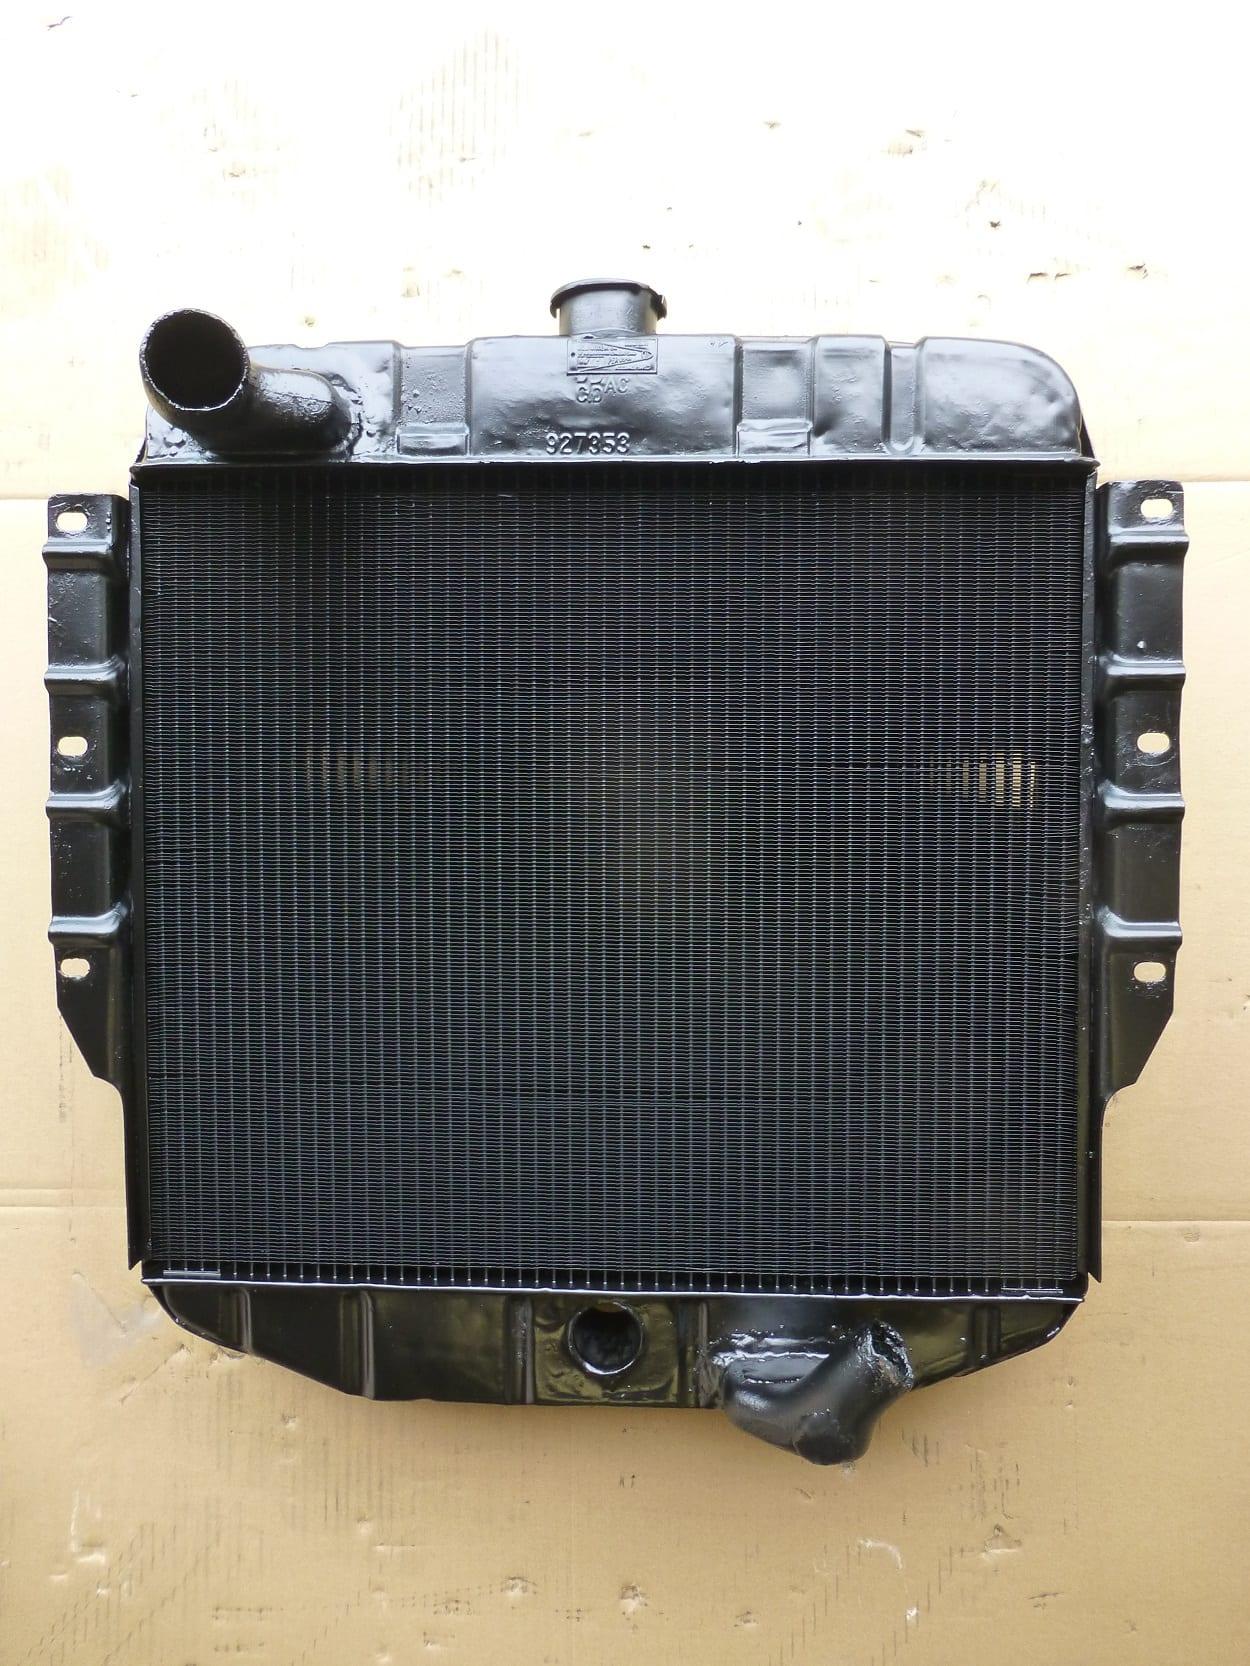 Dodge WC57 Command Car Radiator